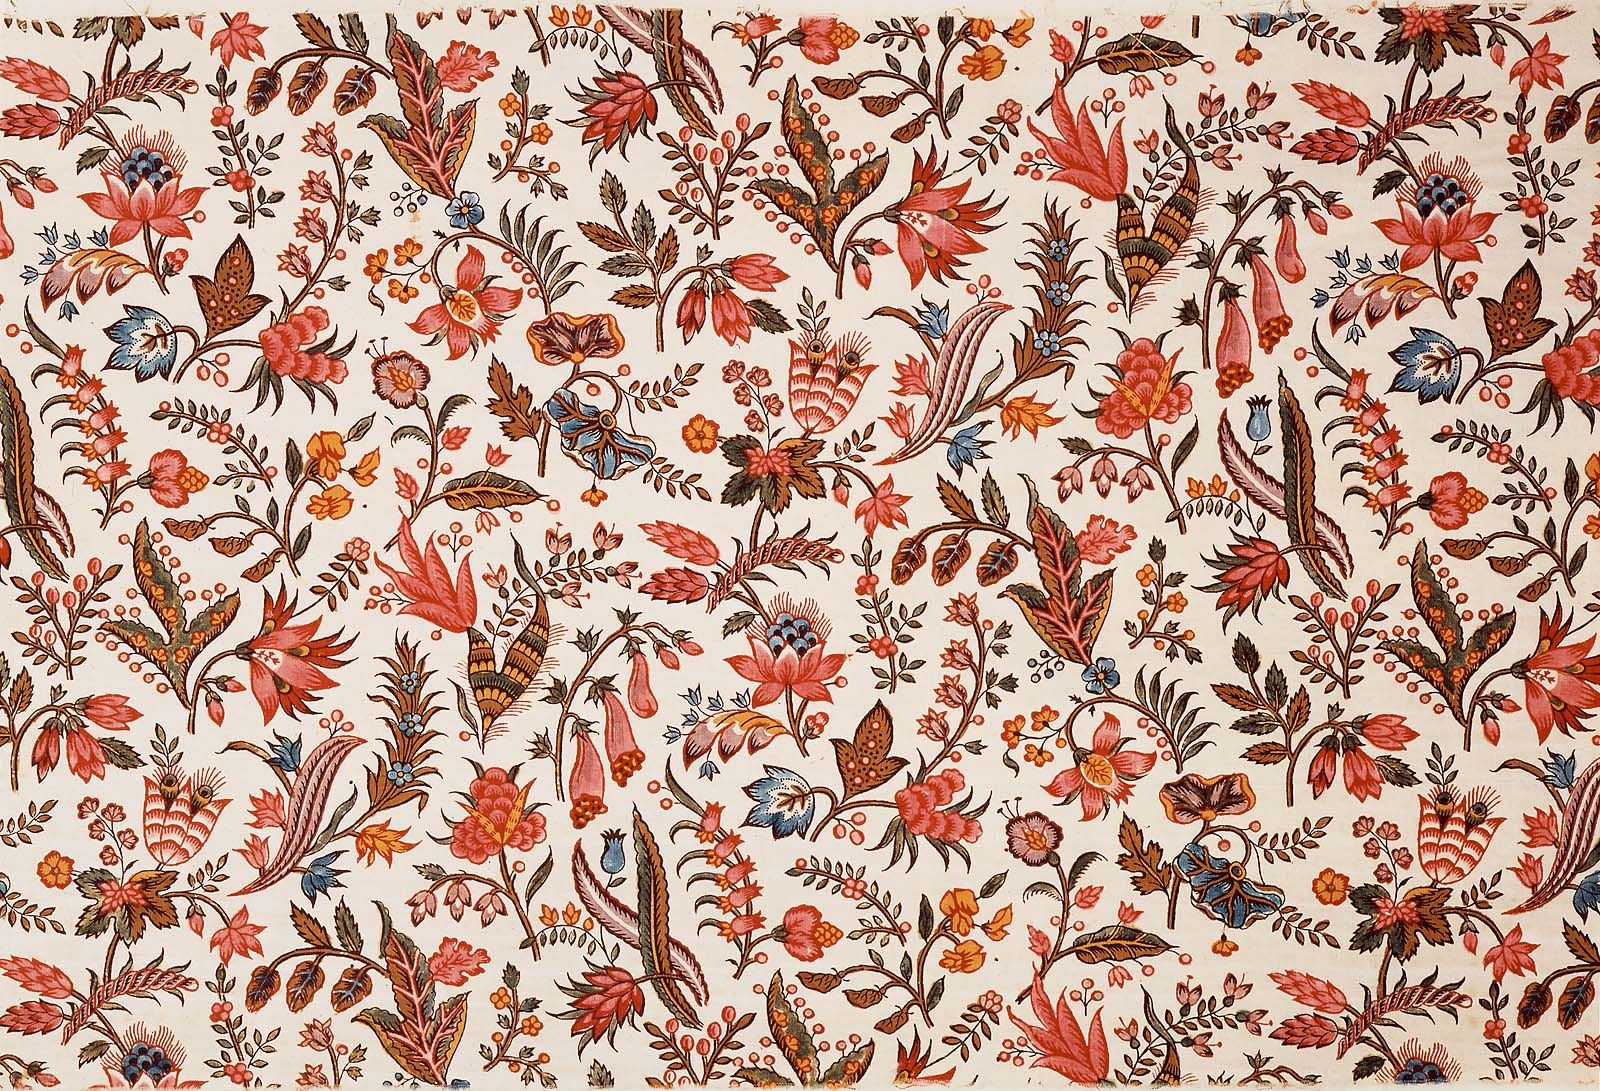 Fabric | Museum of Fine Arts, Boston